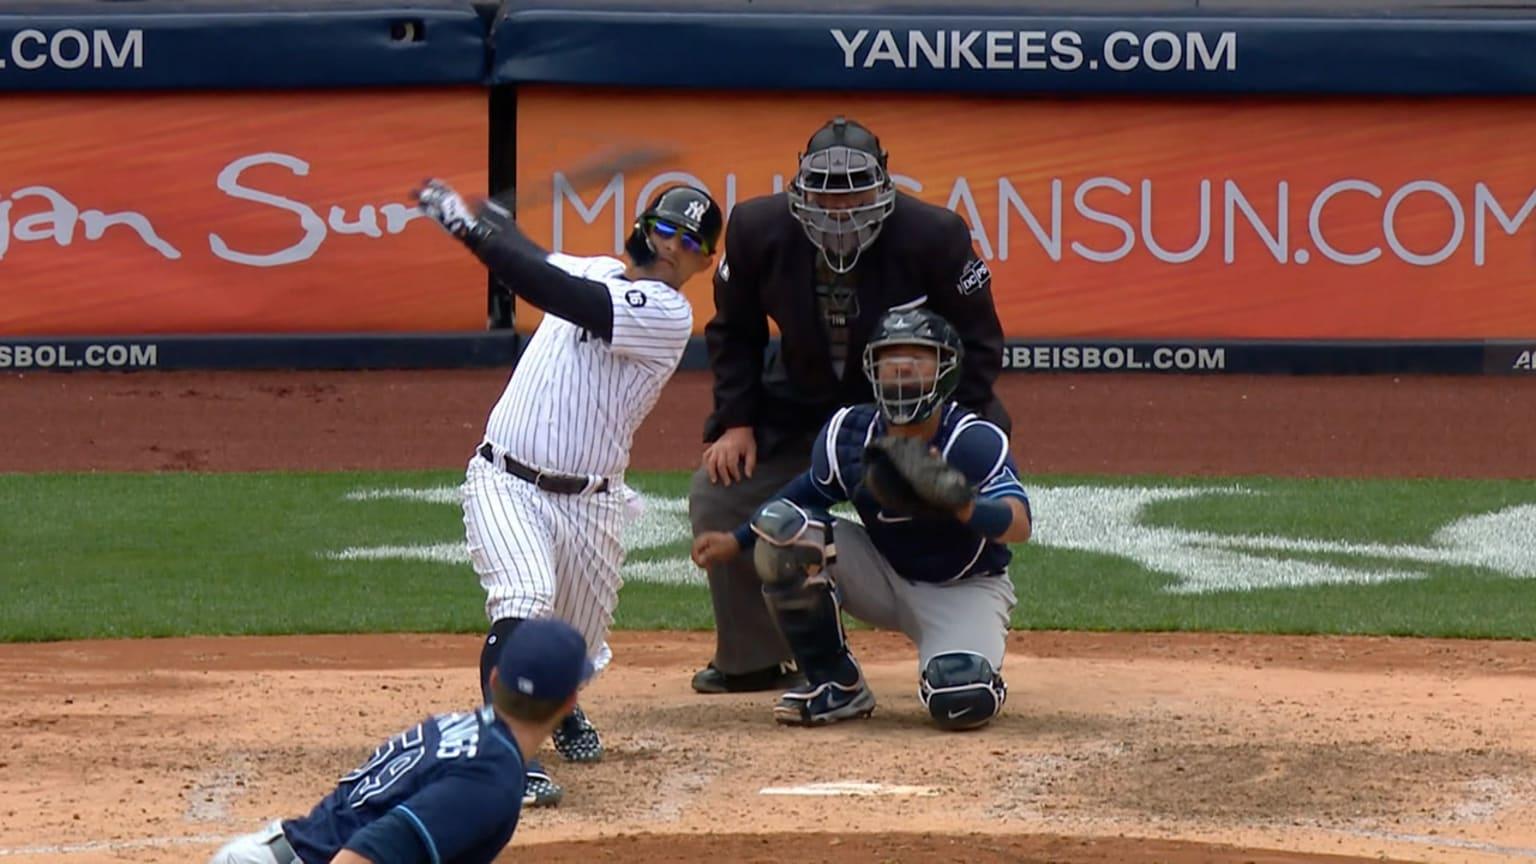 L'odore suona 1st HR come Yankee |  17/04/2021 thumbnail